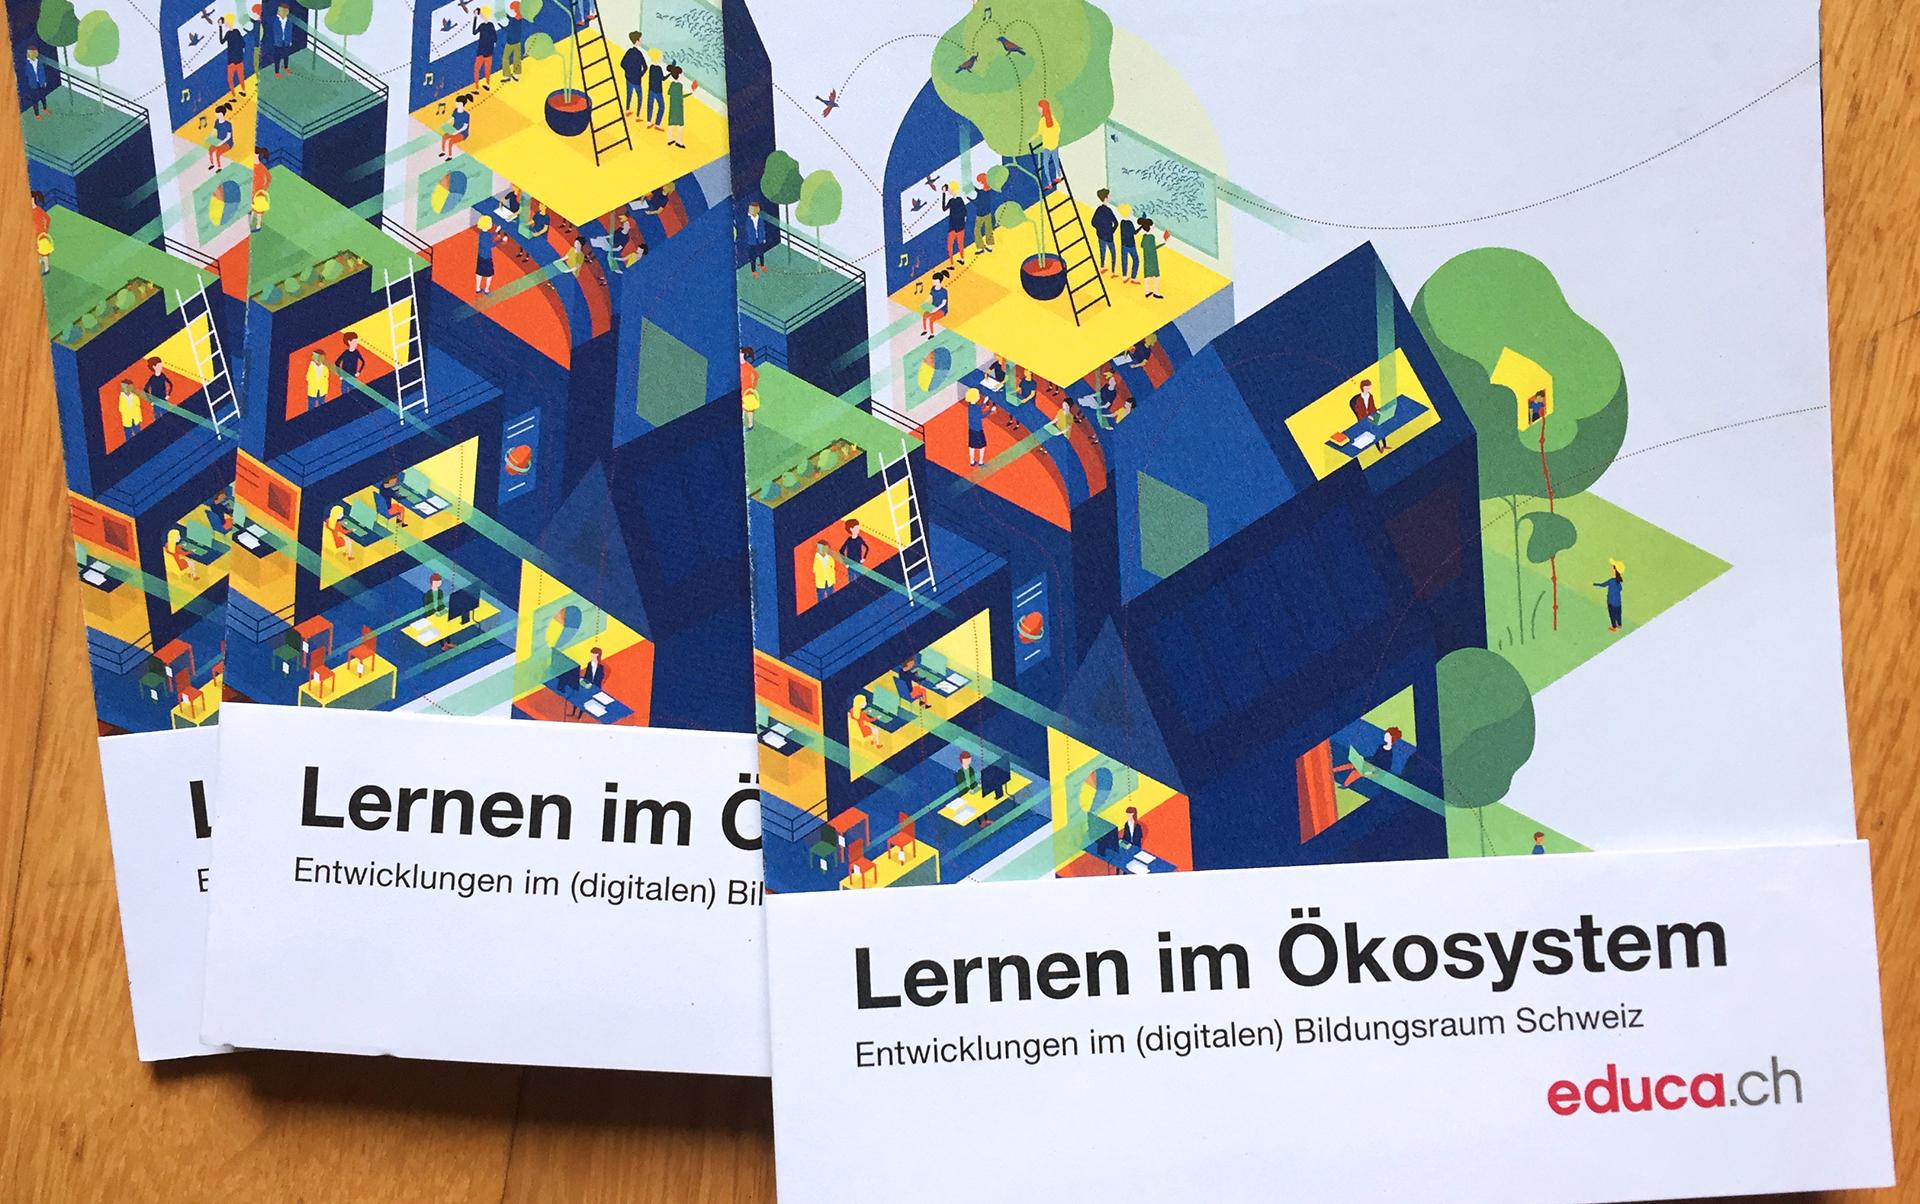 Educa Poster: Lernen im Ökosystem